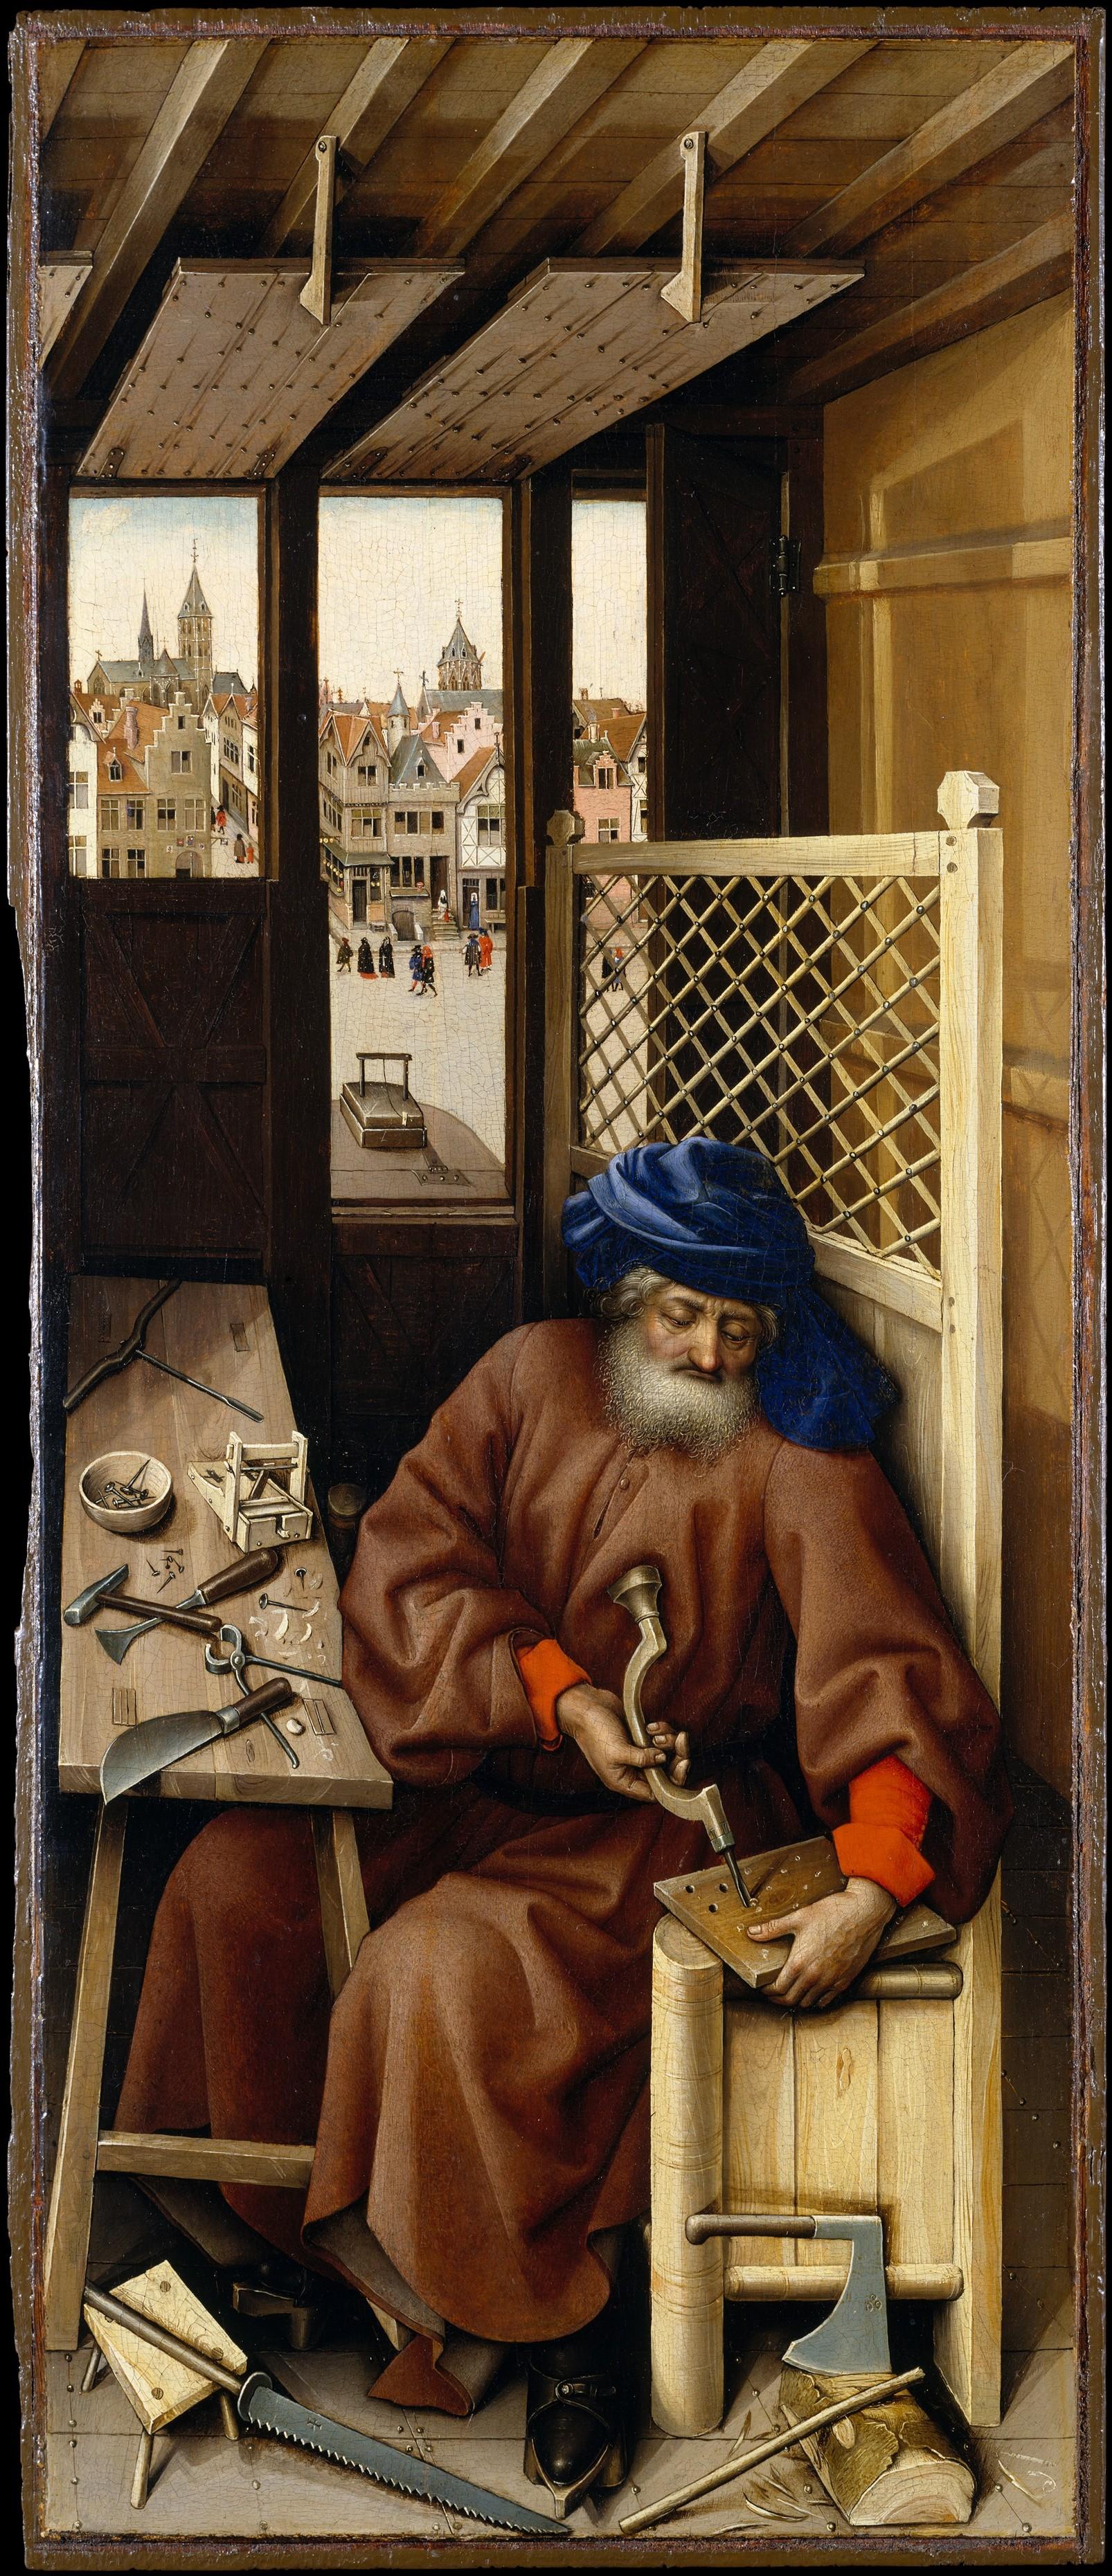 https://upload.wikimedia.org/wikipedia/commons/f/fb/Annunciation_Triptych_%28Merode_Altarpiece%29_MET_DT7258.jpg